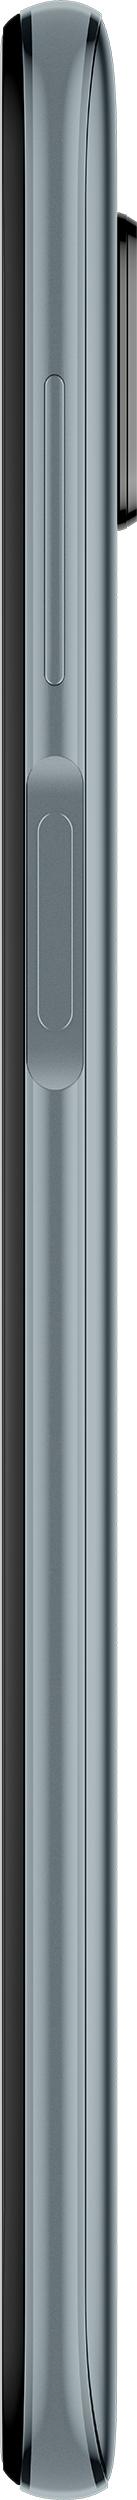 Redmi Note 9 Pro okostelefon (Global) - 6+64GB, Interstellar Grey